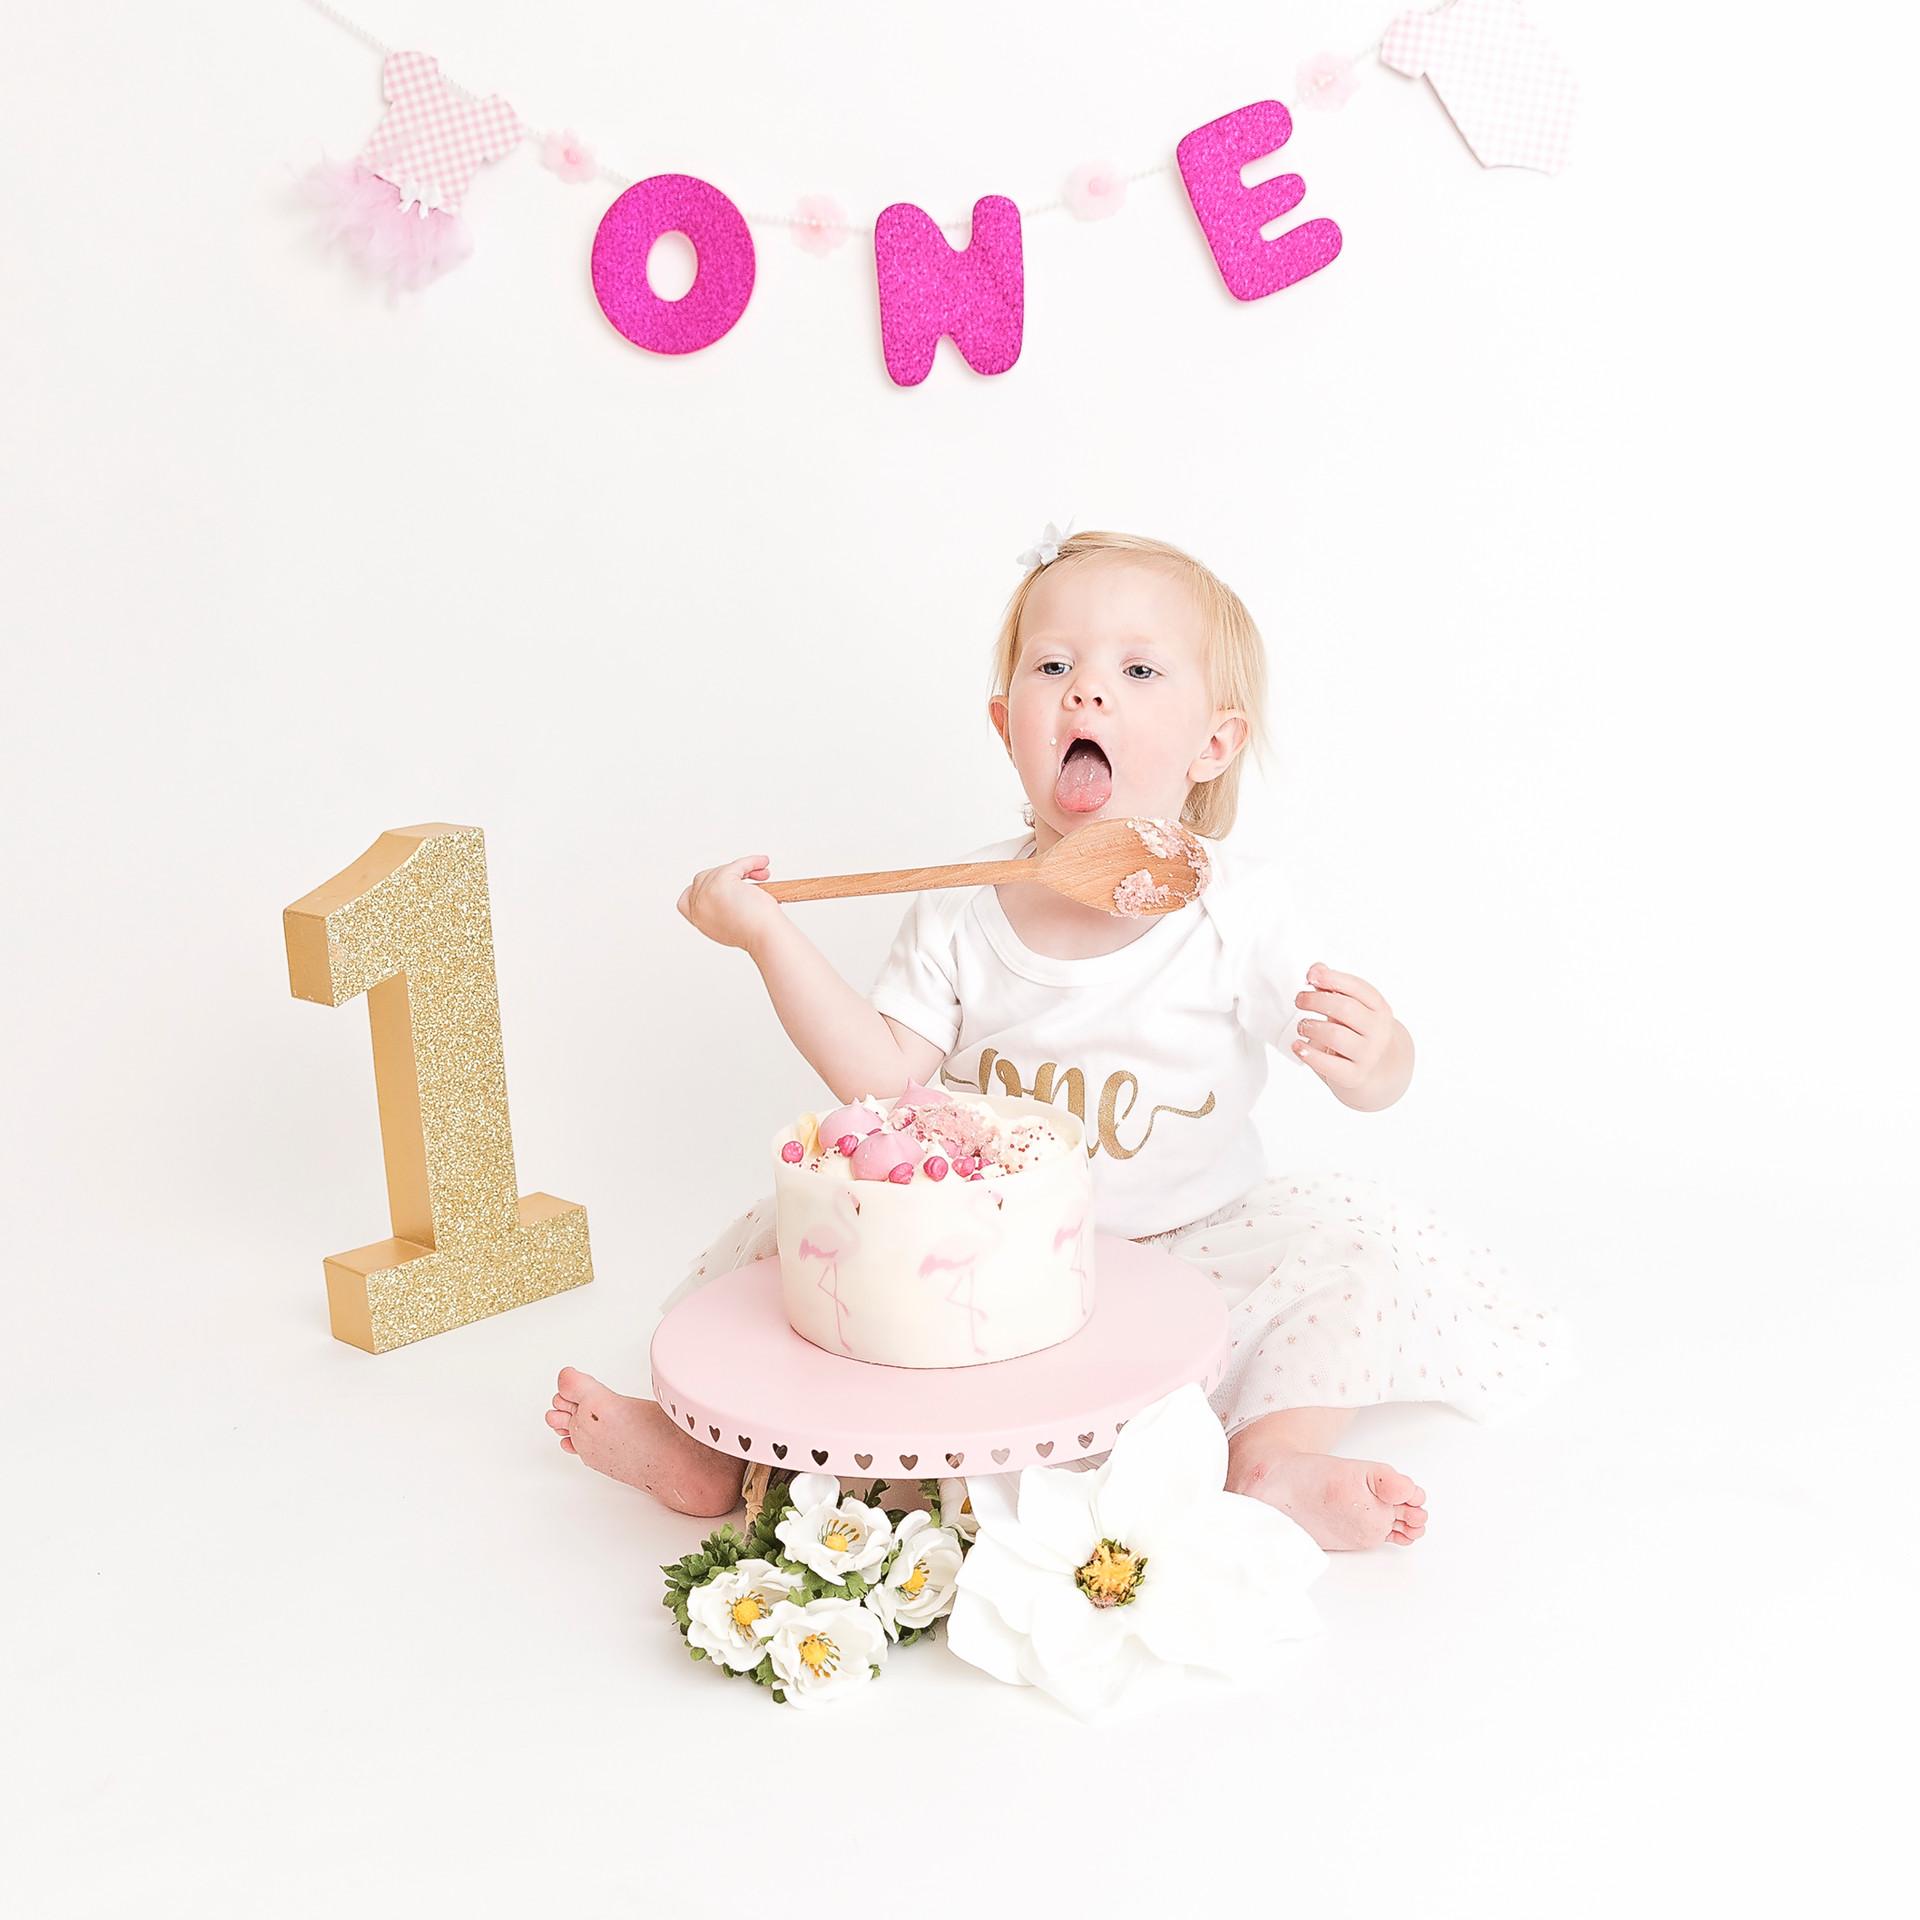 Baby girl first birthday cake smash and bath splash wirral photographer